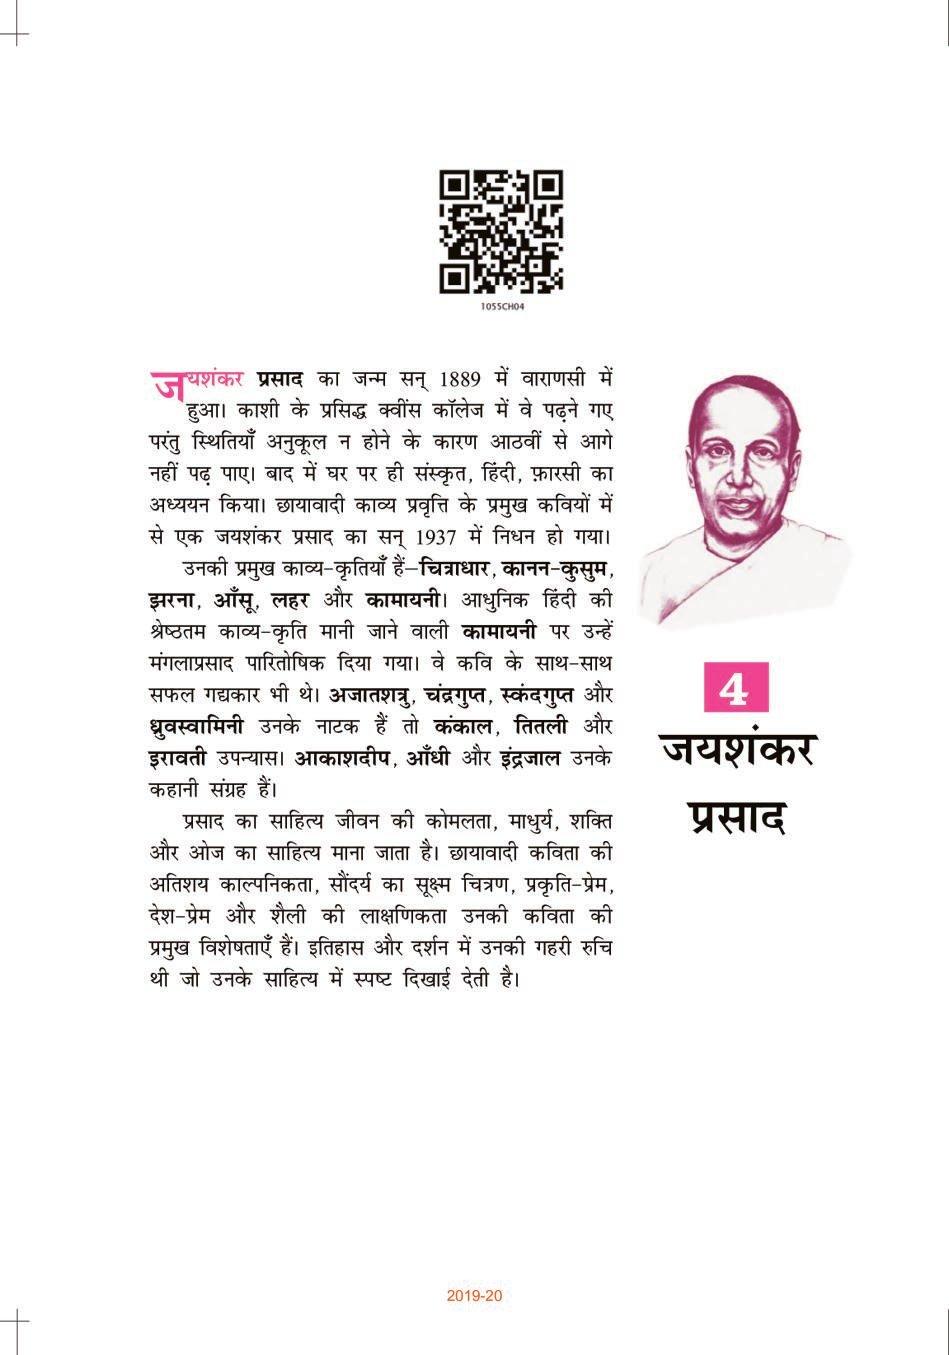 NCERT Book Class 10 Hindi (क्षितिज) Chapter 4 जयशंकर प्रसाद - Page 1